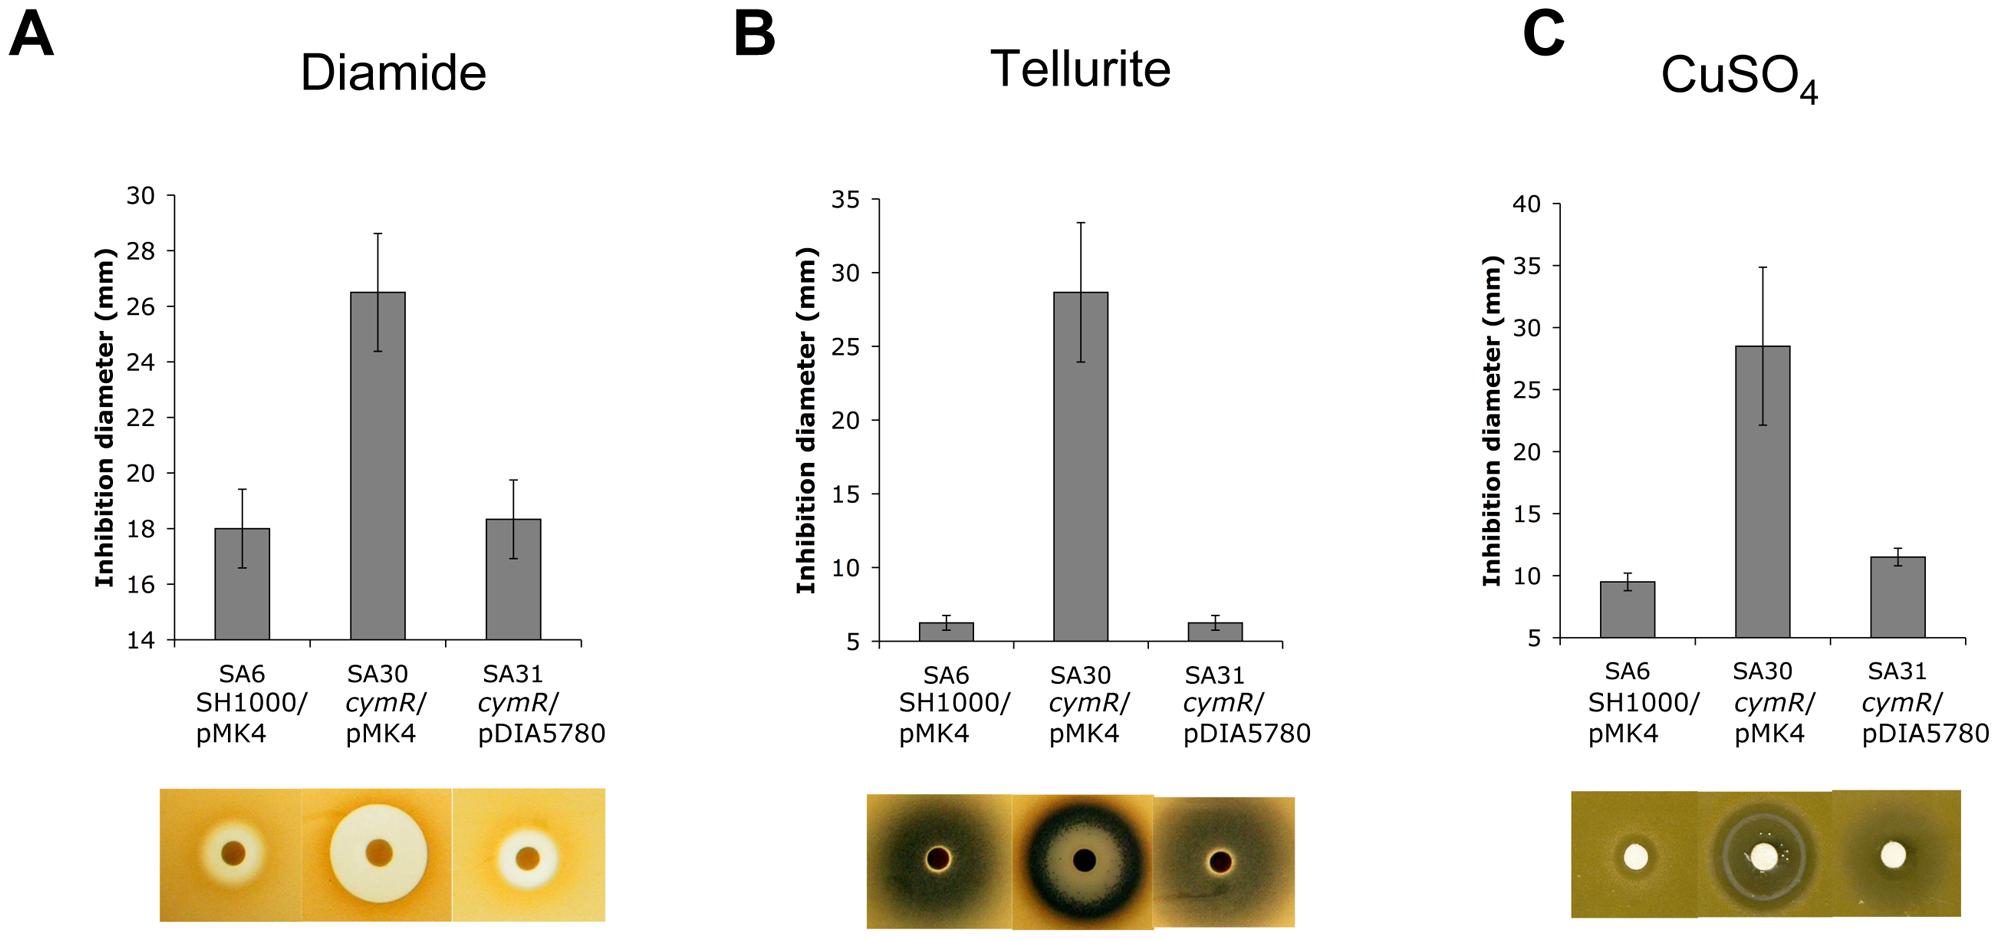 Stress resistance phenotypes of a <i>S. aureus</i> Δ<i>cymR</i> mutant.